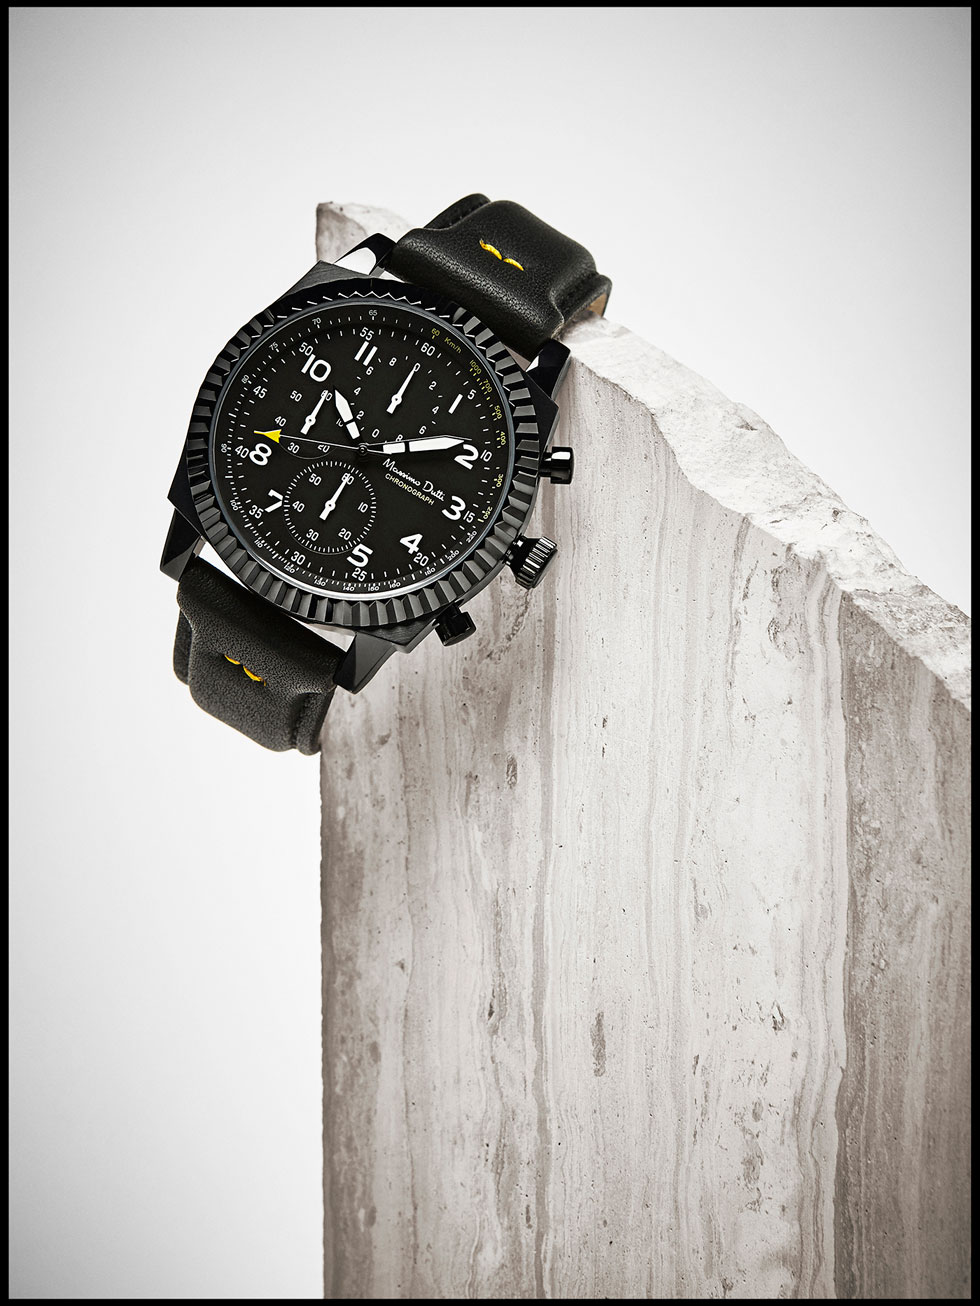 Lo ultimo en relojes masculinos de Massimo Dutti 7